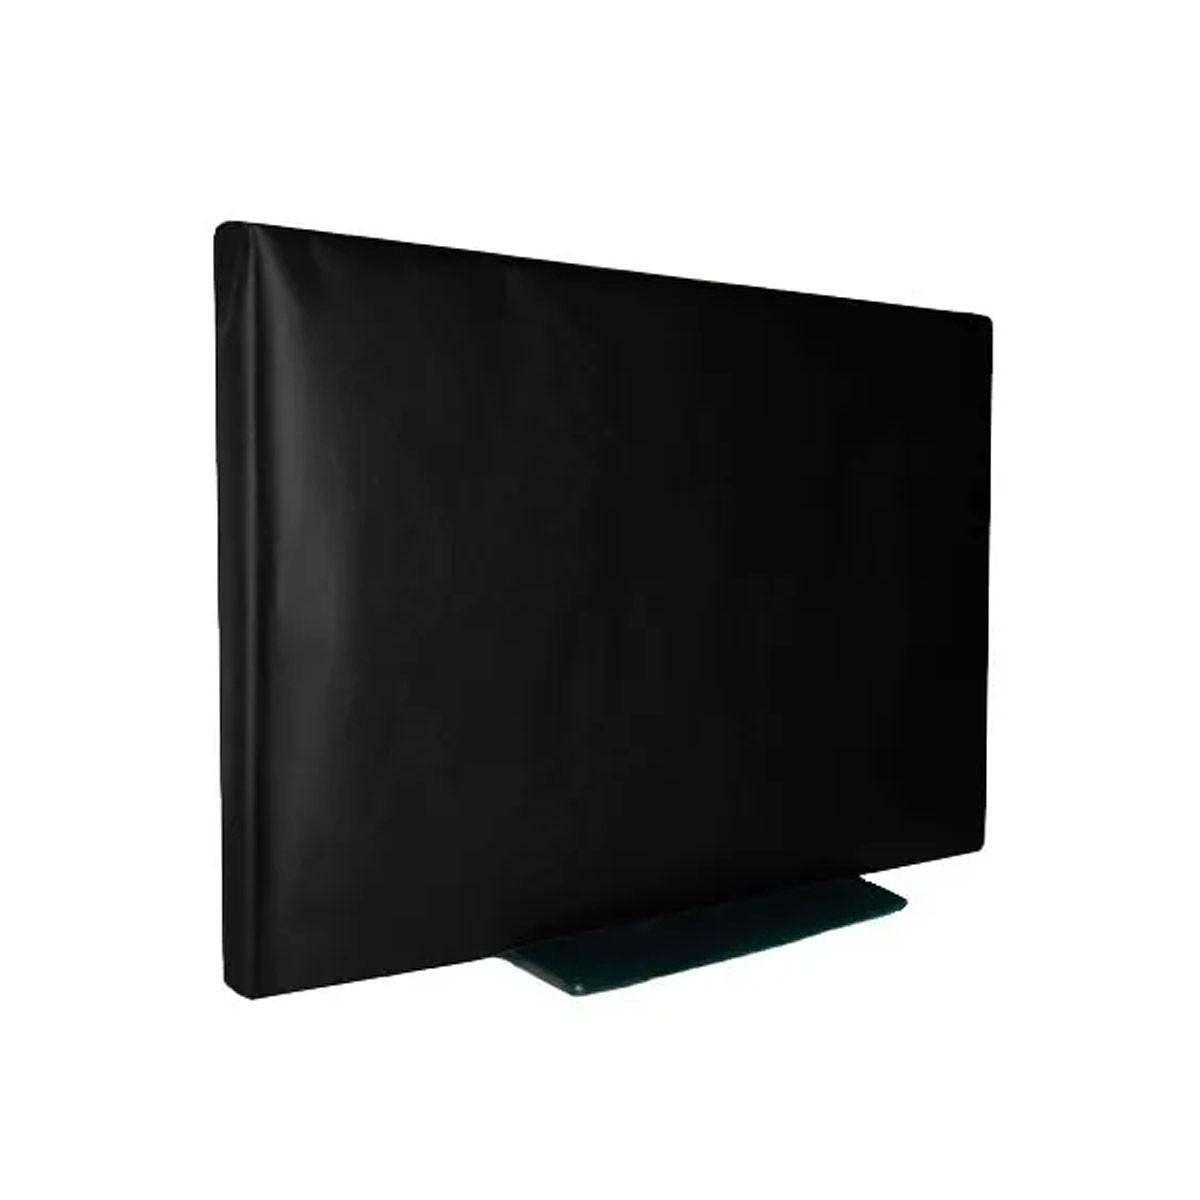 Capa De Luxo Em Corino Para TV LCD 50